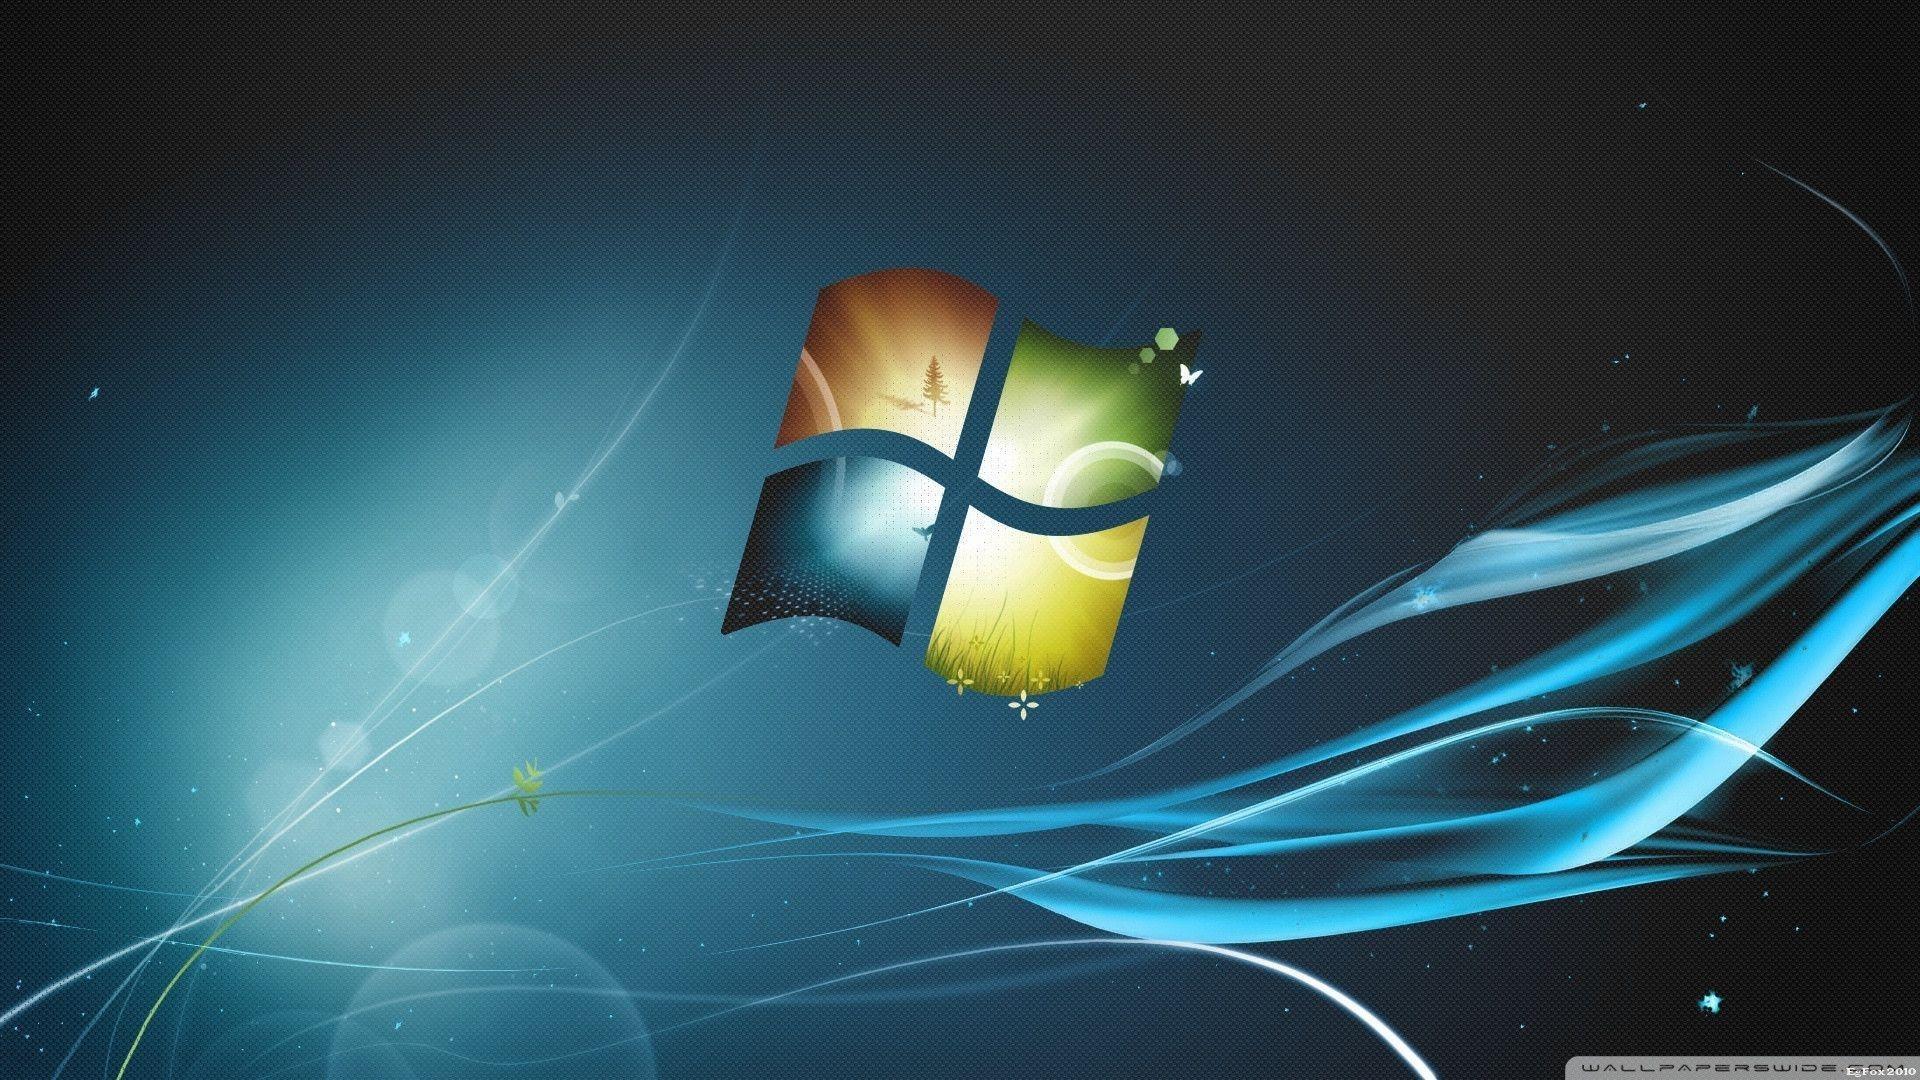 Windows photo galery download Picasa